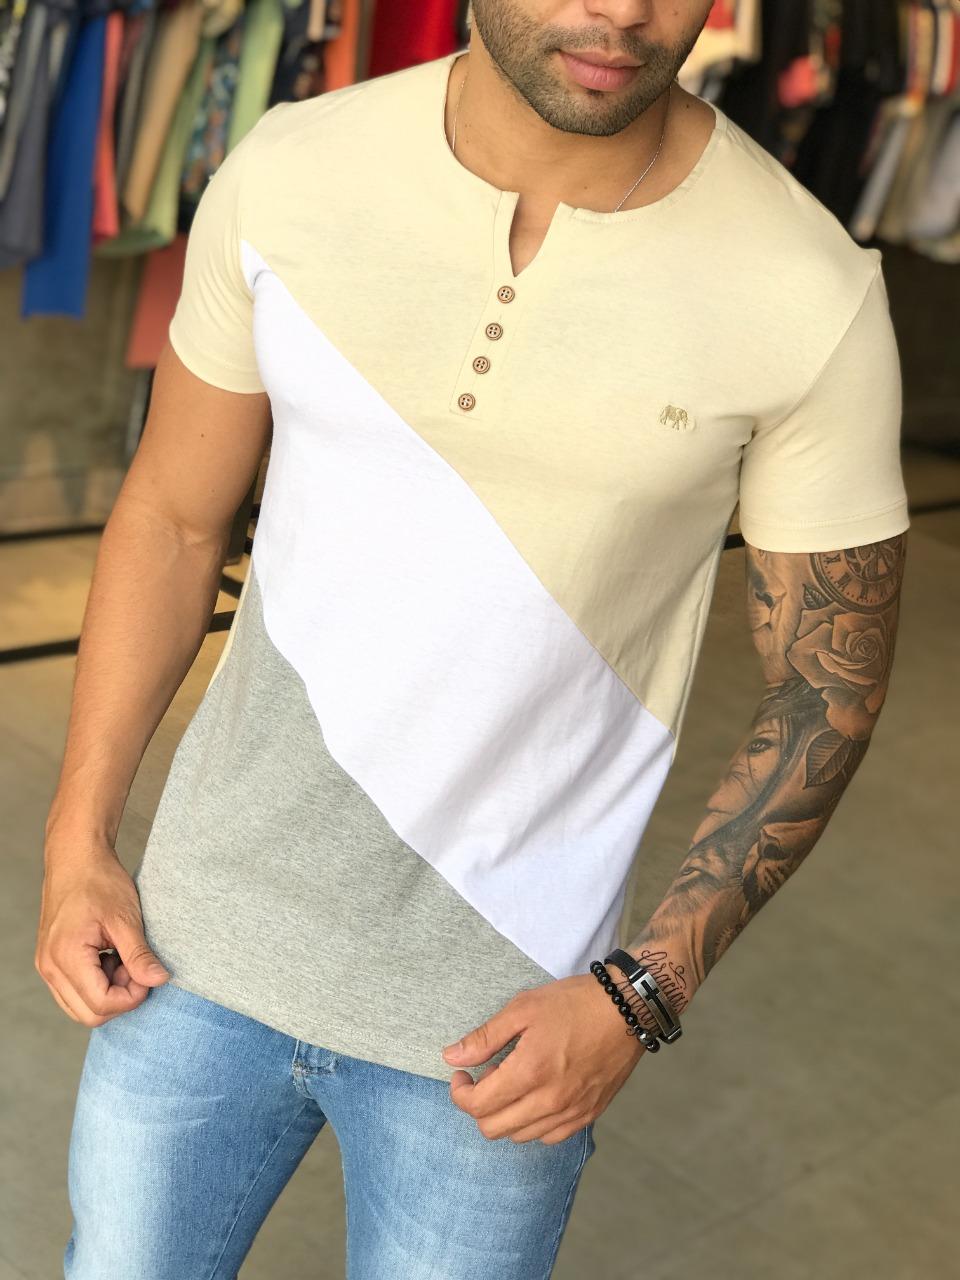 Camiseta M Artt Branca Basic Detalhe Amarelo e Cinza  - Harpia Moda - Moda Masculina & Acessórios